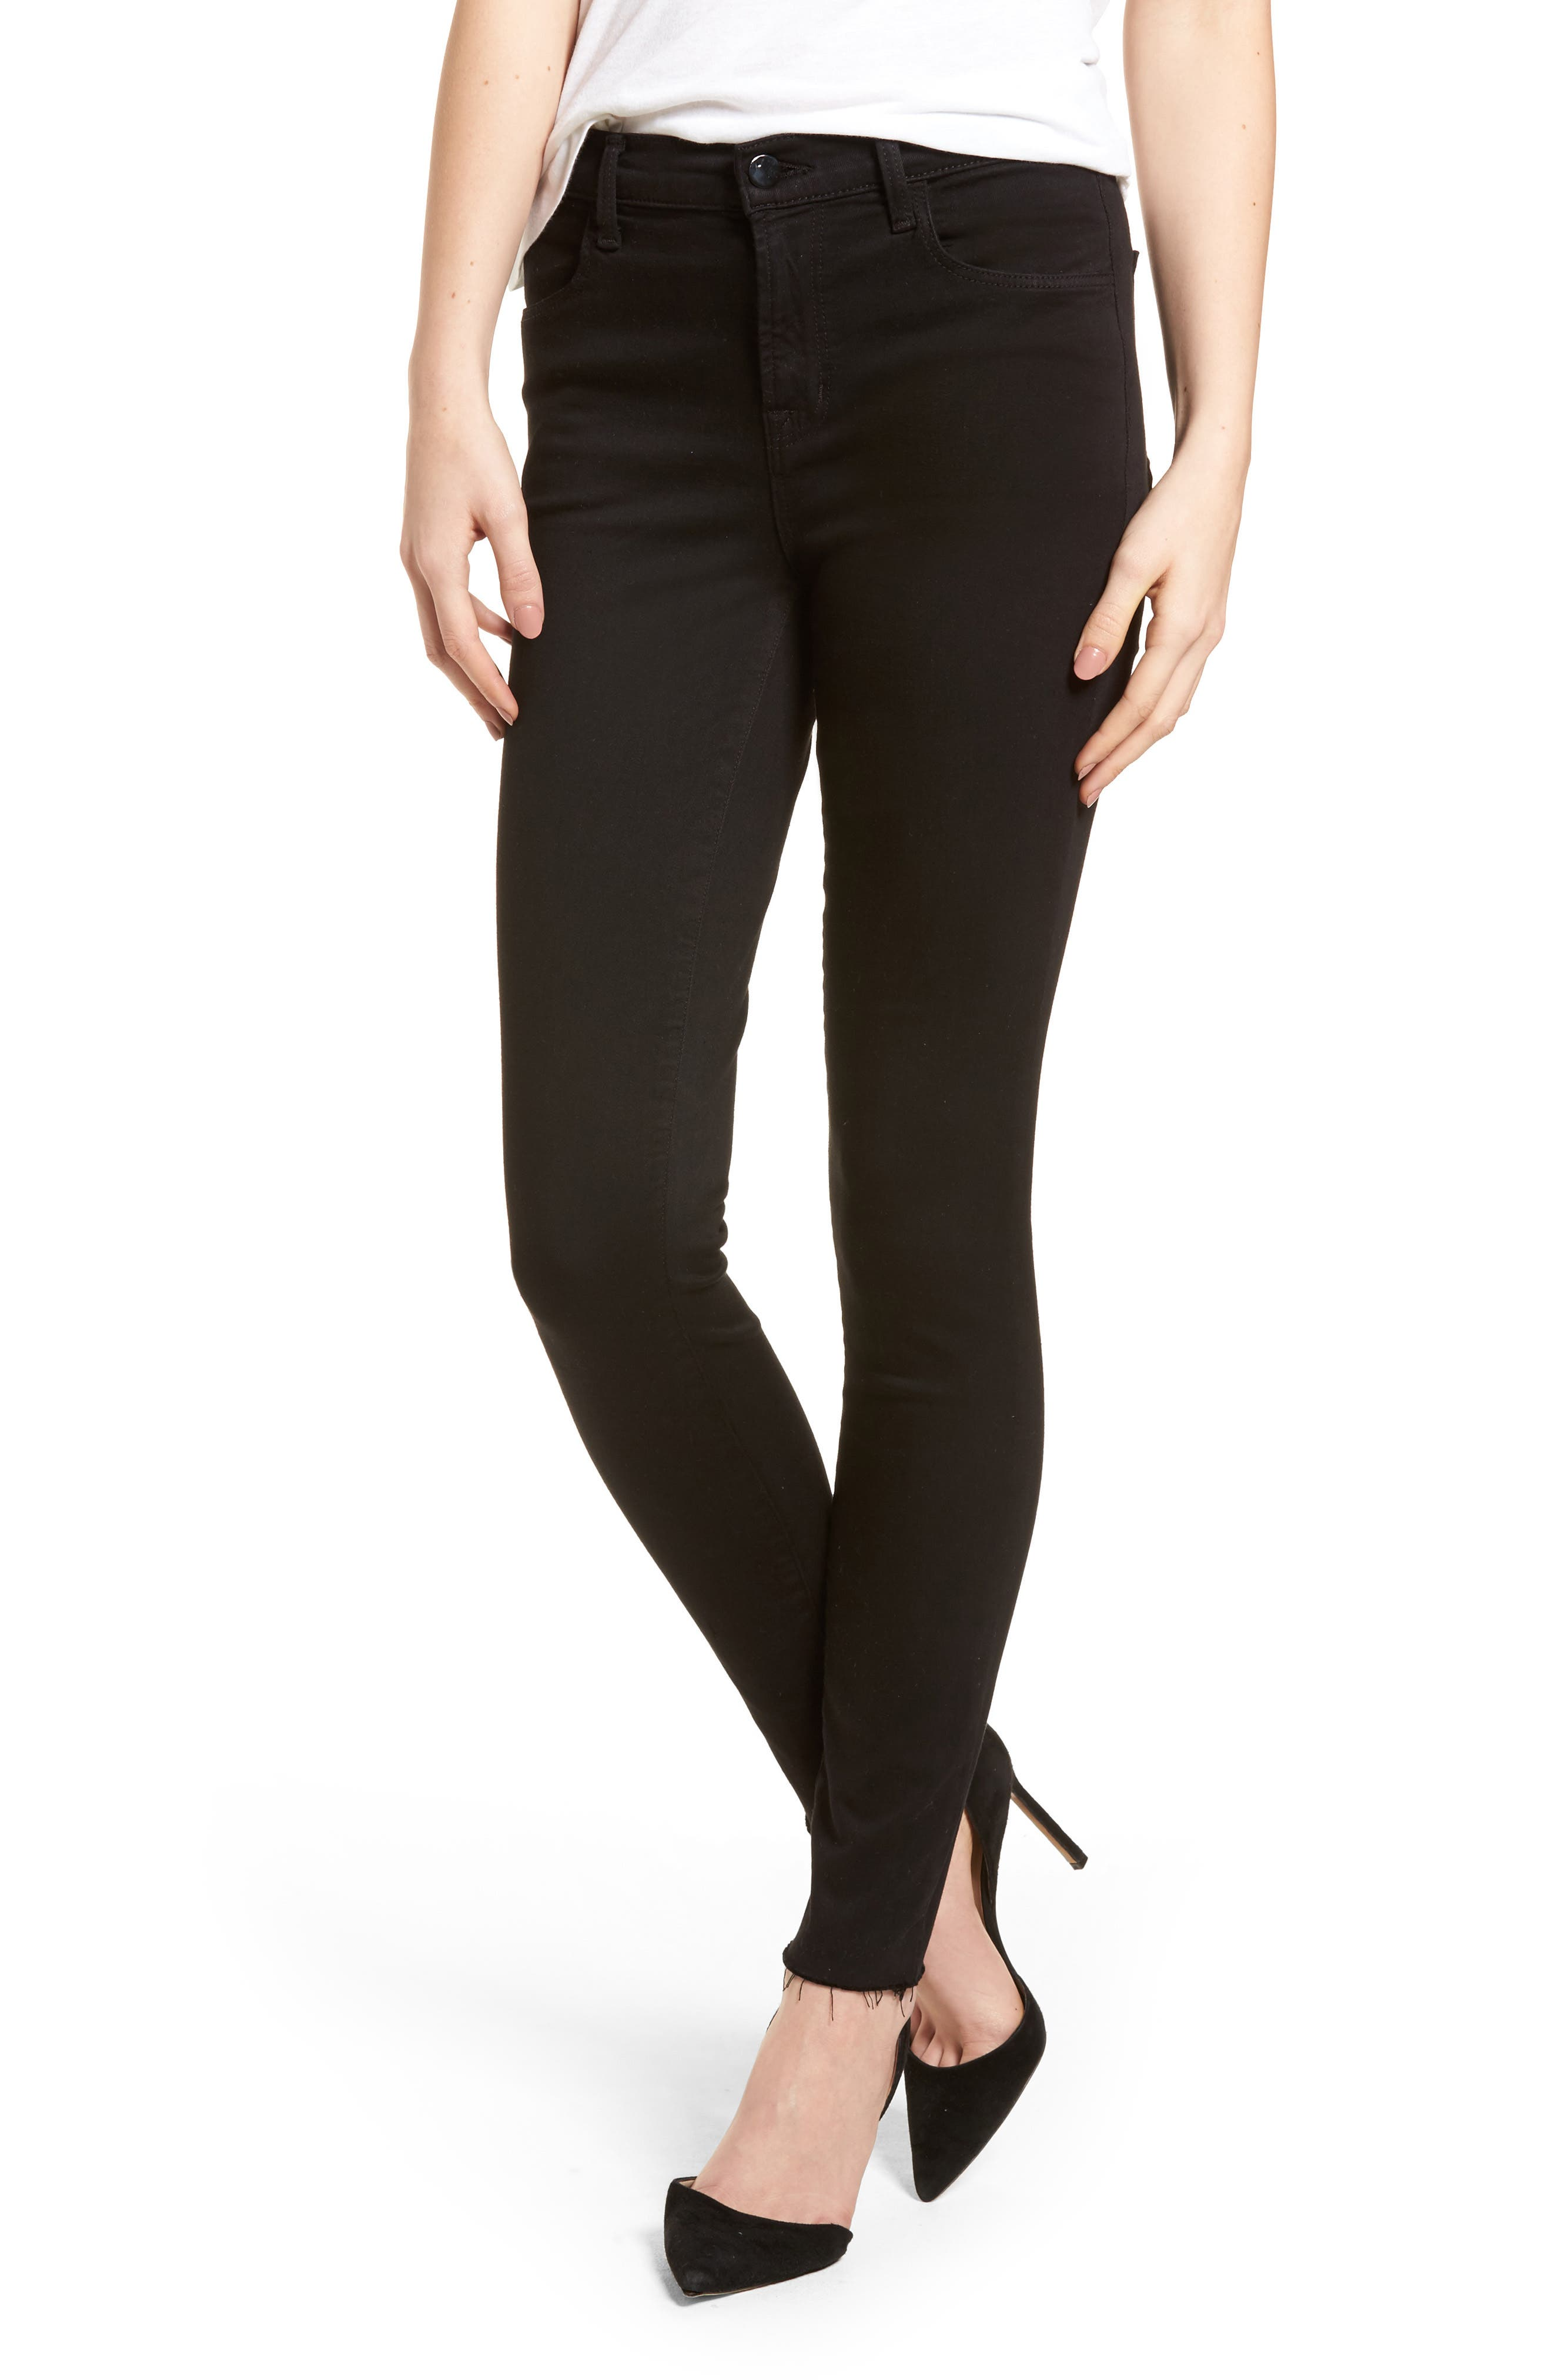 Maria High Waist Skinny Jeans,                             Main thumbnail 1, color,                             003